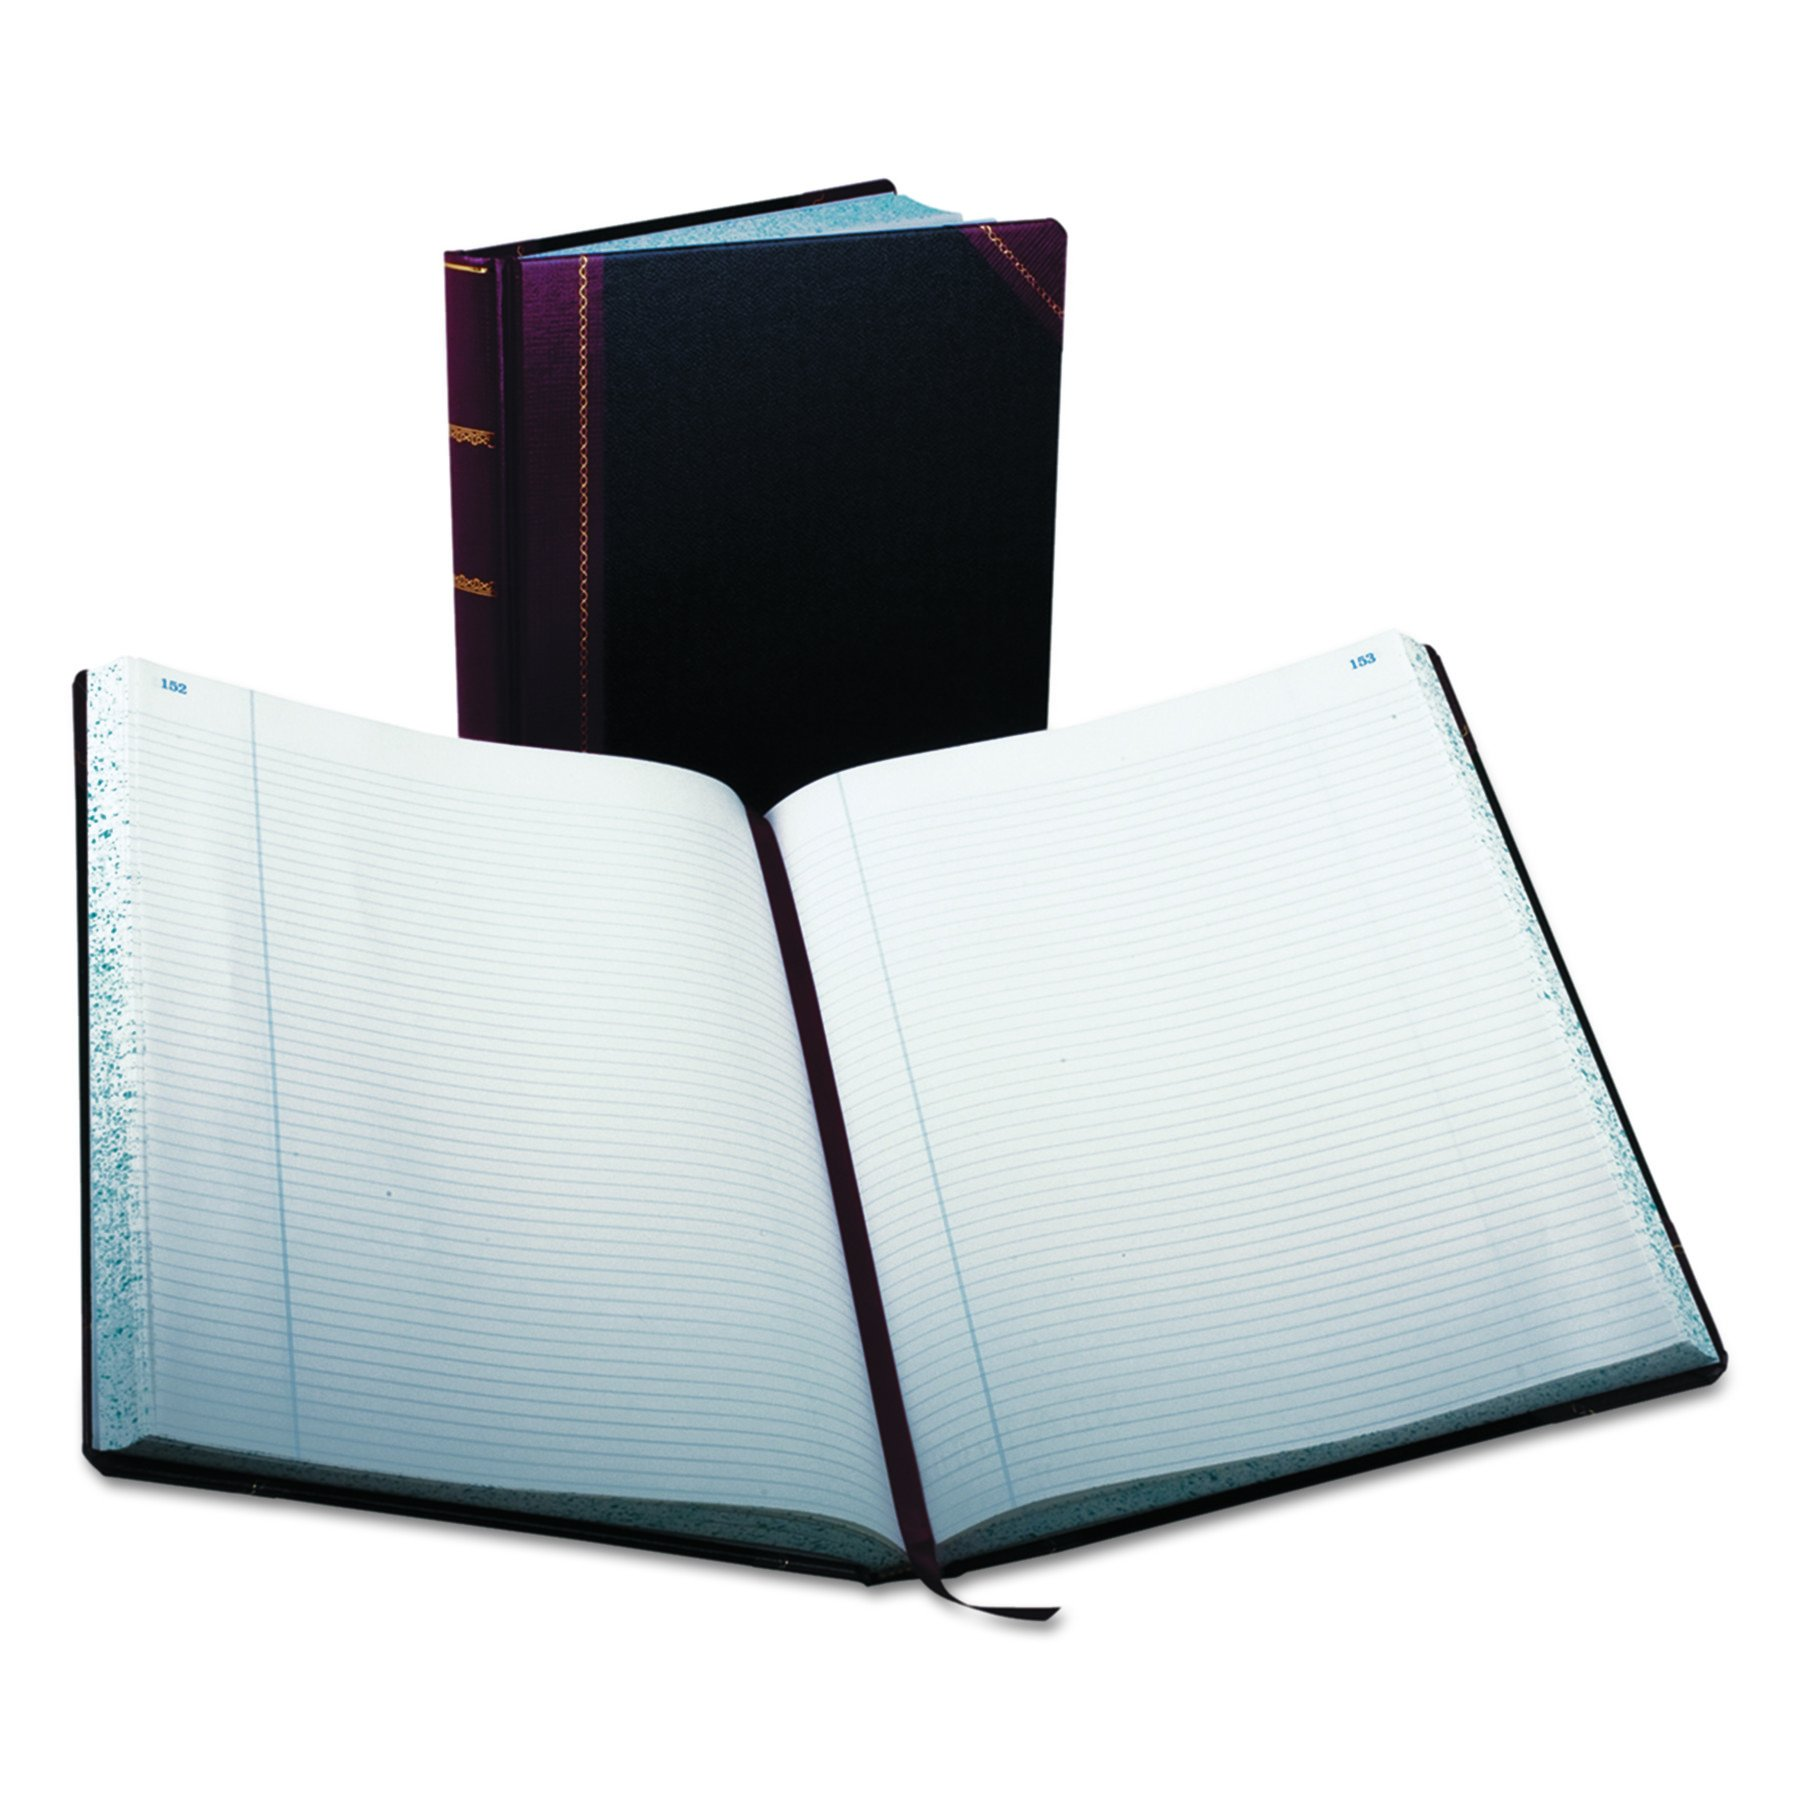 Boorum & Pease 23 Series Columnar Book, Record, 300 Page, Black/Red (23-300-R)